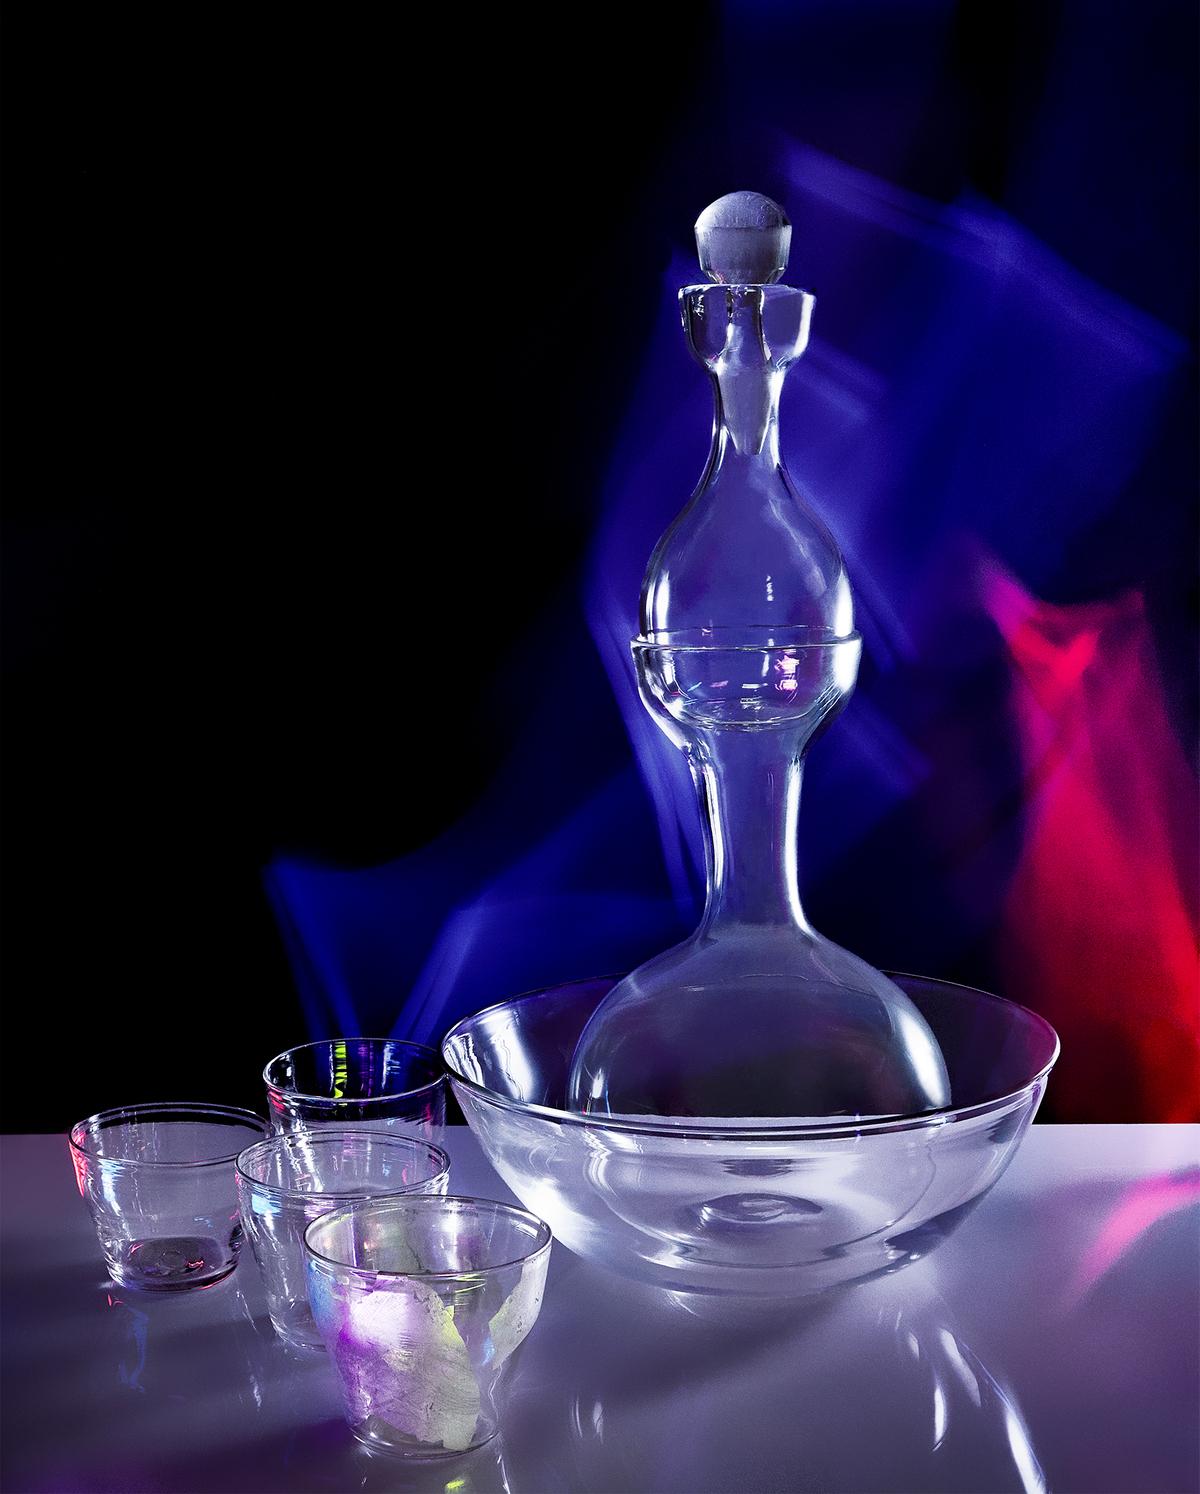 Glassware - George Barberis Still Life Photographer